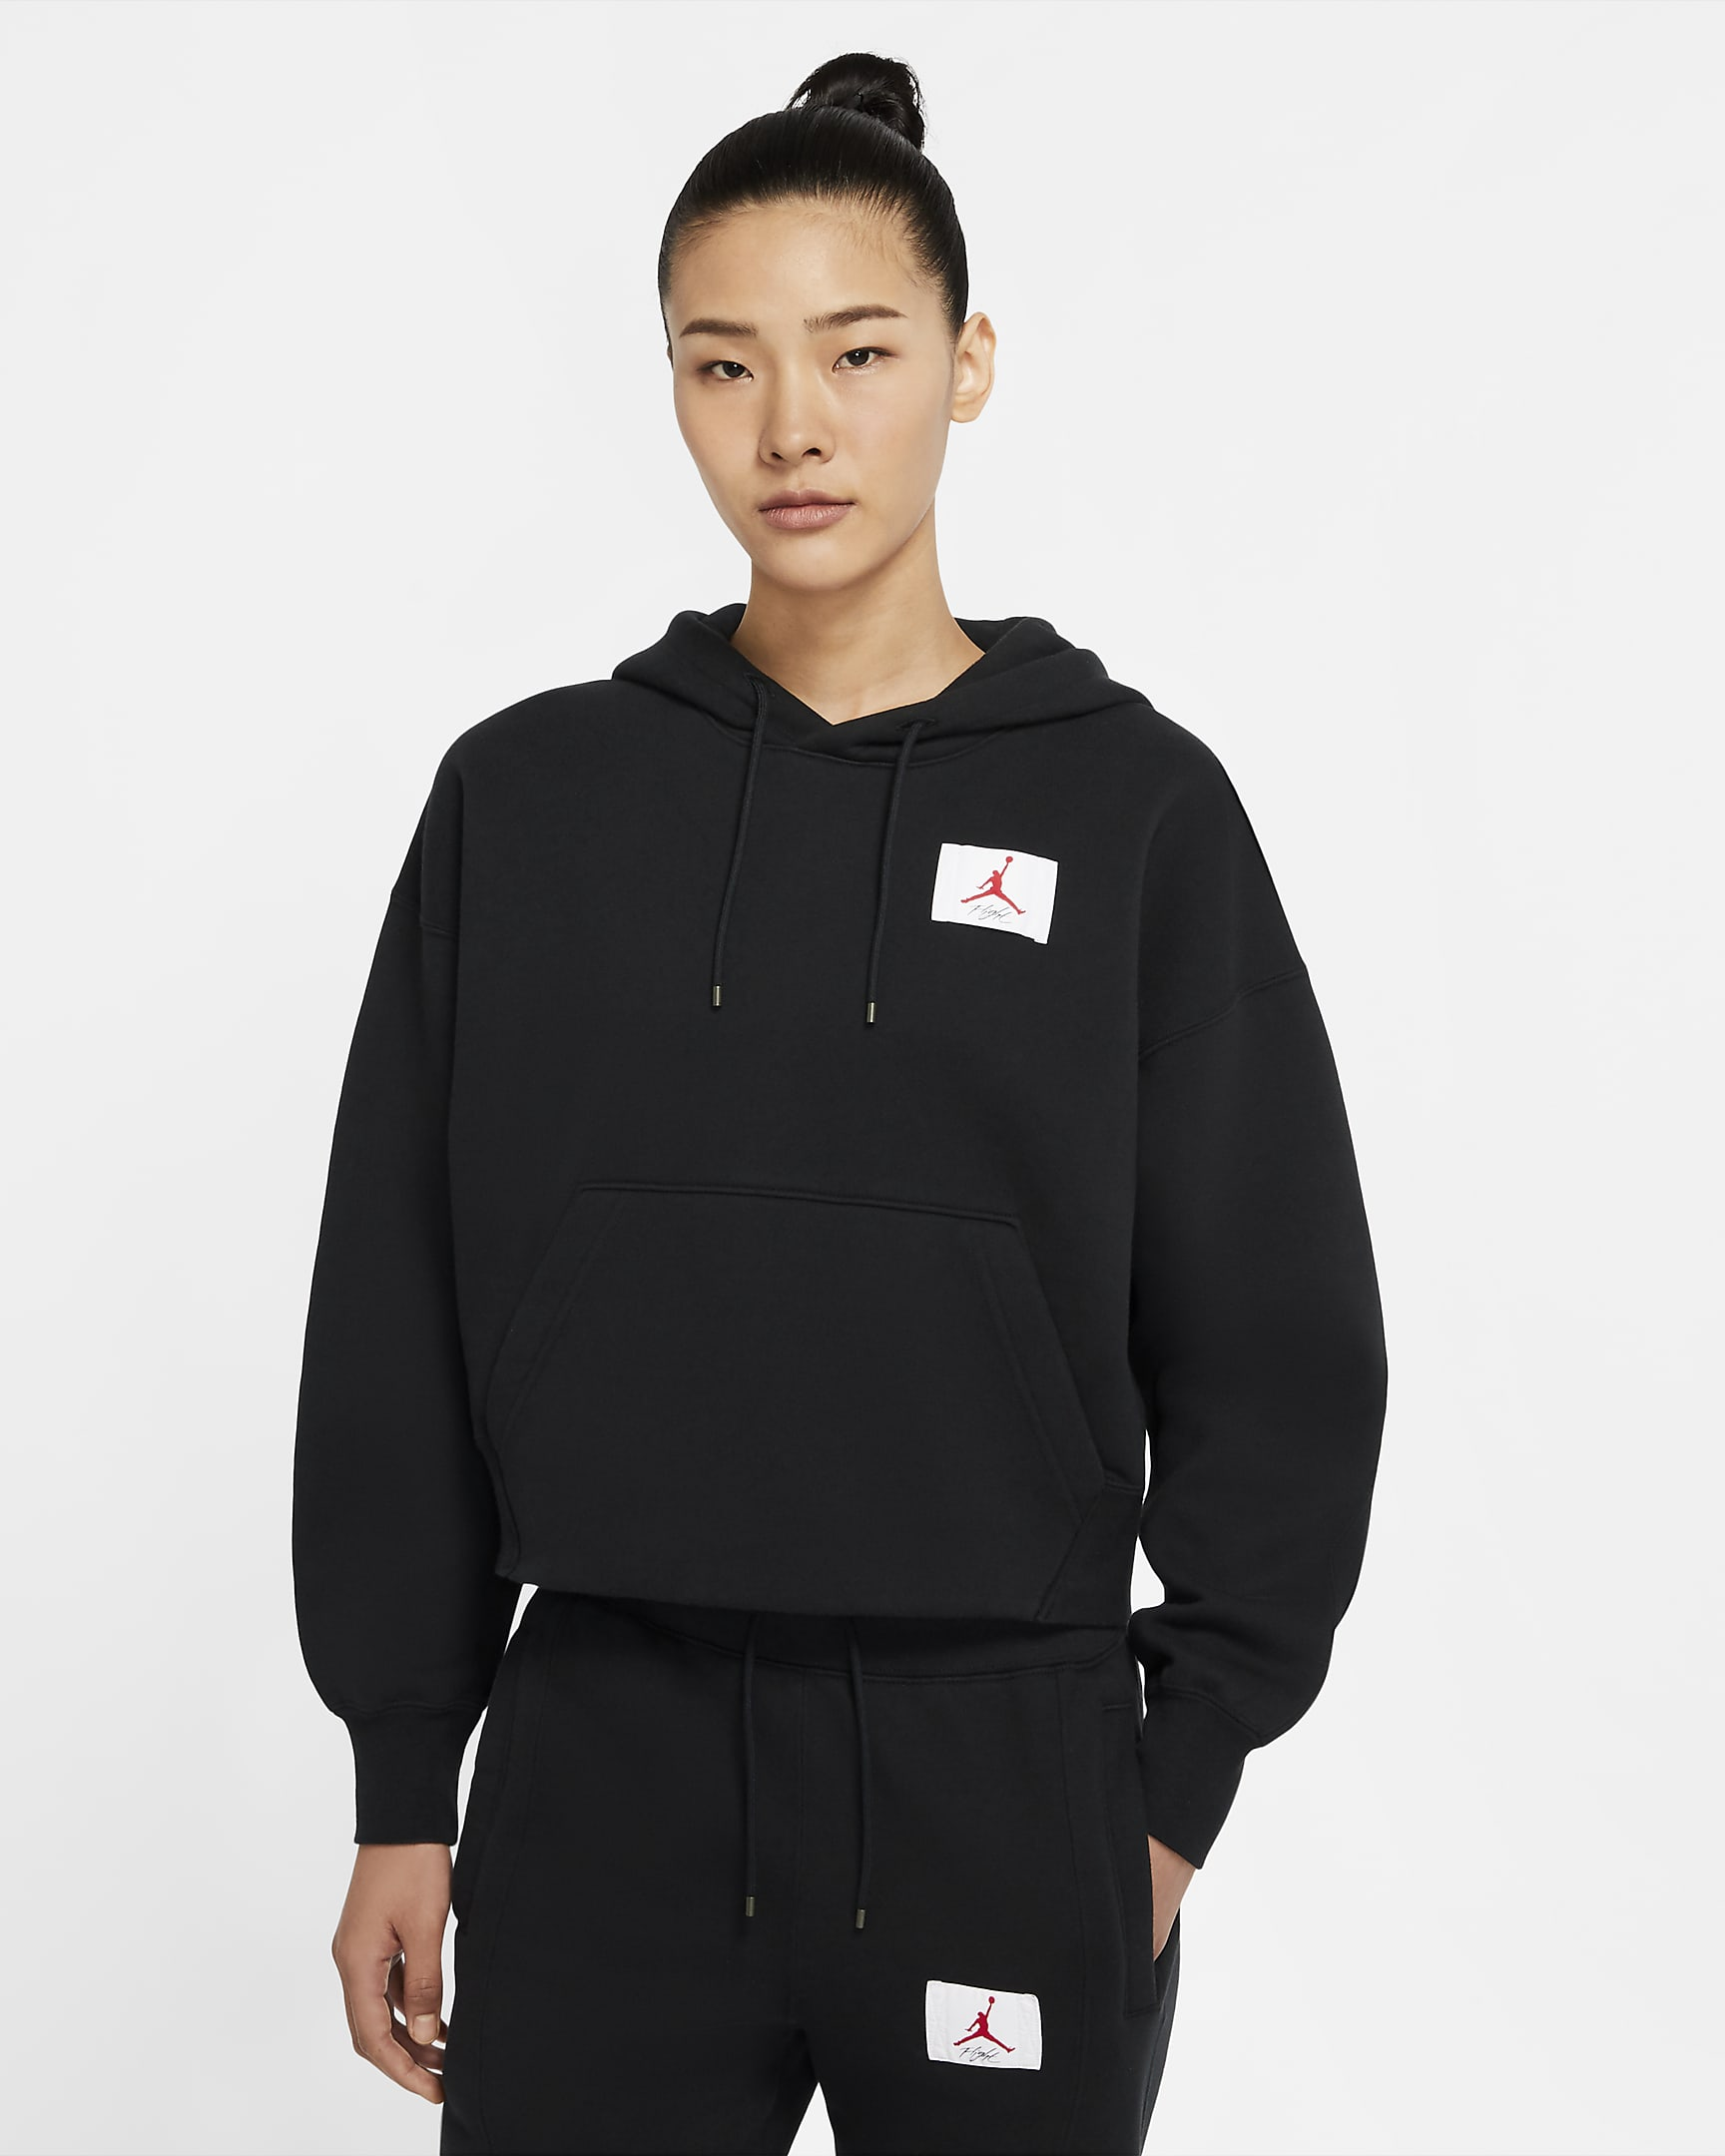 jordan-flight-womens-fleece-pullover-hoodie-M8SP84.png